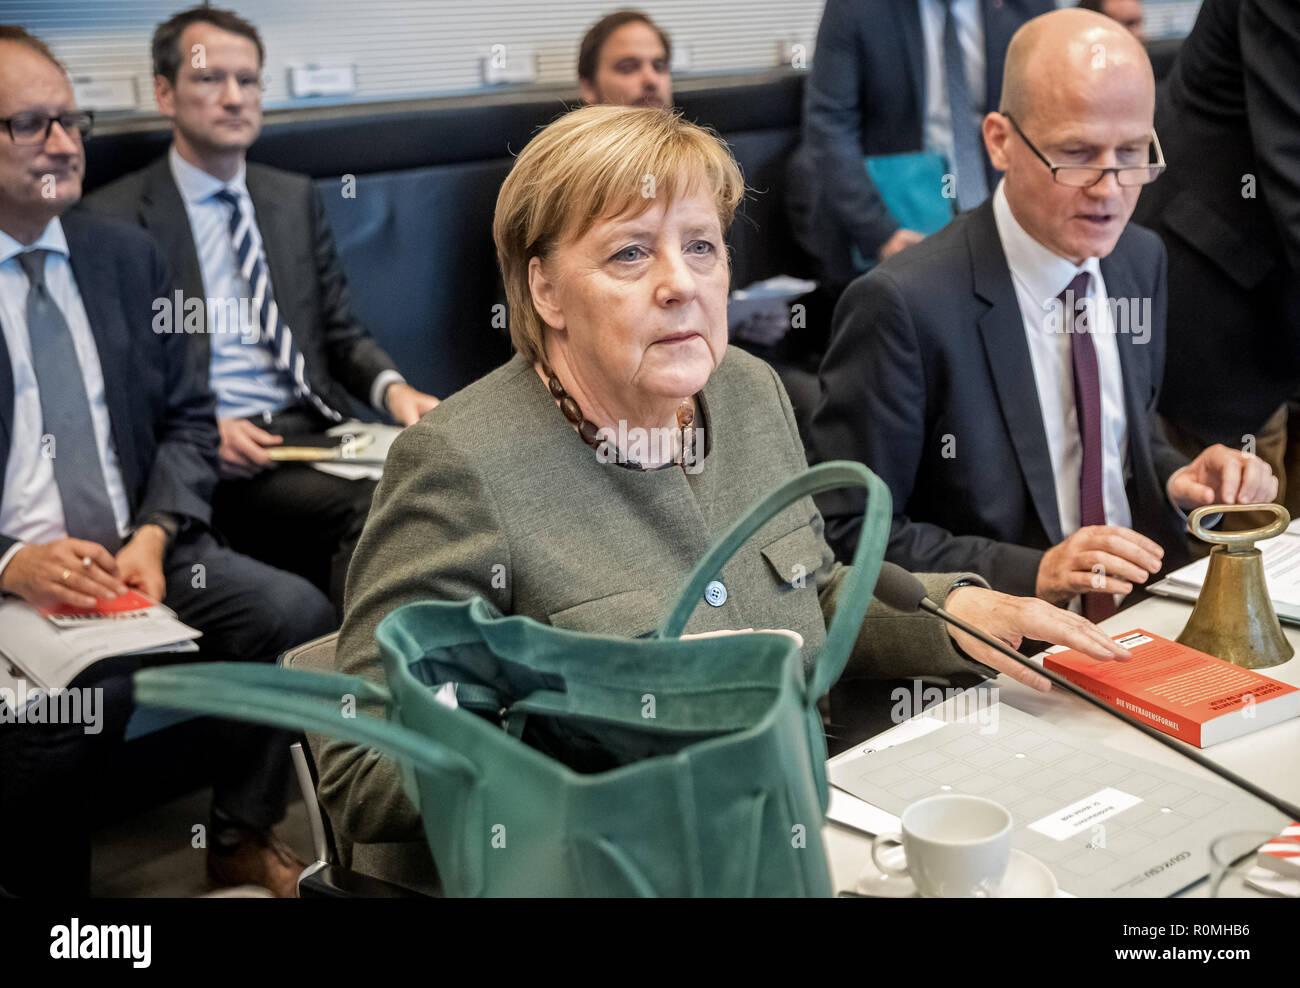 Berlin, Germany. 06th Nov, 2018. Chancellor Angela Merkel (CDU) is waiting next to Ralph Brinkhaus (CDU, r), leader of the CDU/CSU parliamentary group in the Bundestag, for the start of the parliamentary group meeting. Credit: Michael Kappeler/dpa/Alamy Live News - Stock Image